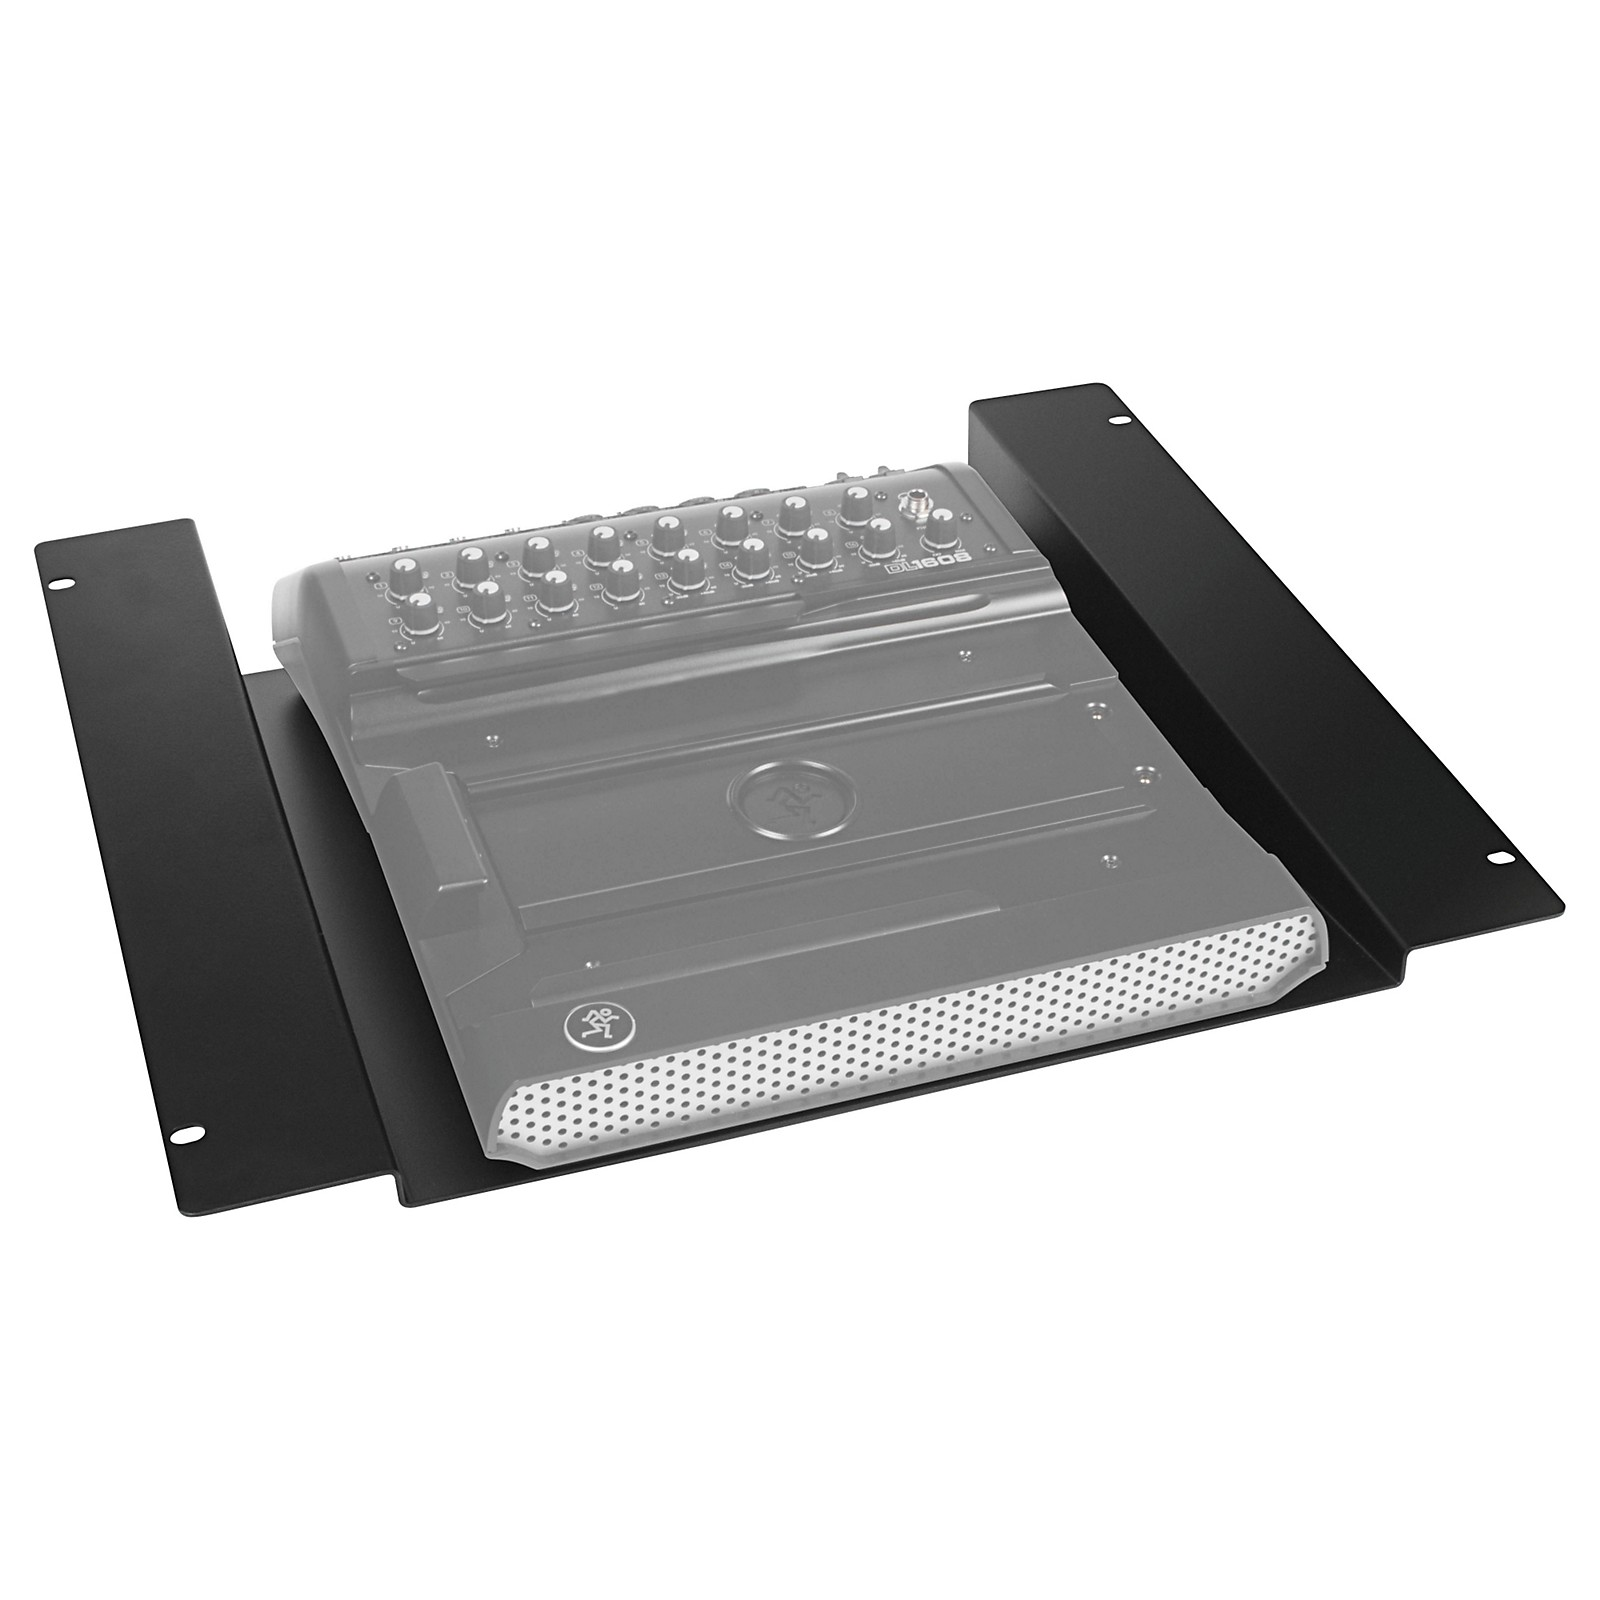 Mackie Rackmount Bracket for Mackie DL1608 iPad Mixer